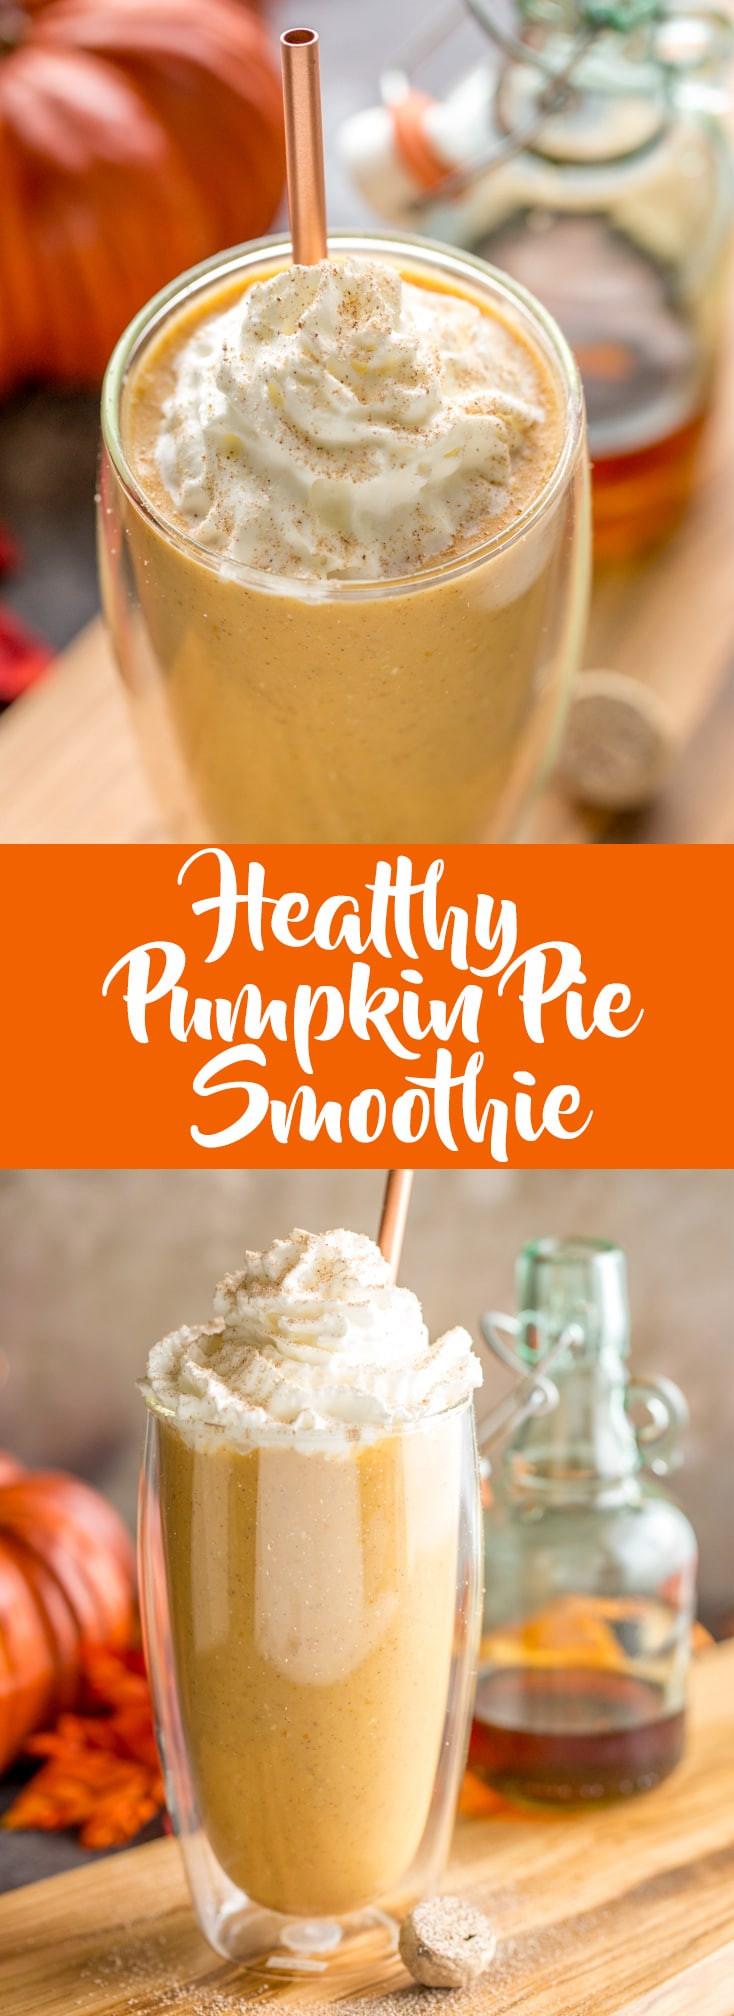 Healthy Pumpkin Pie Recipes  Healthy Pumpkin Pie Smoothie Fox and Briar